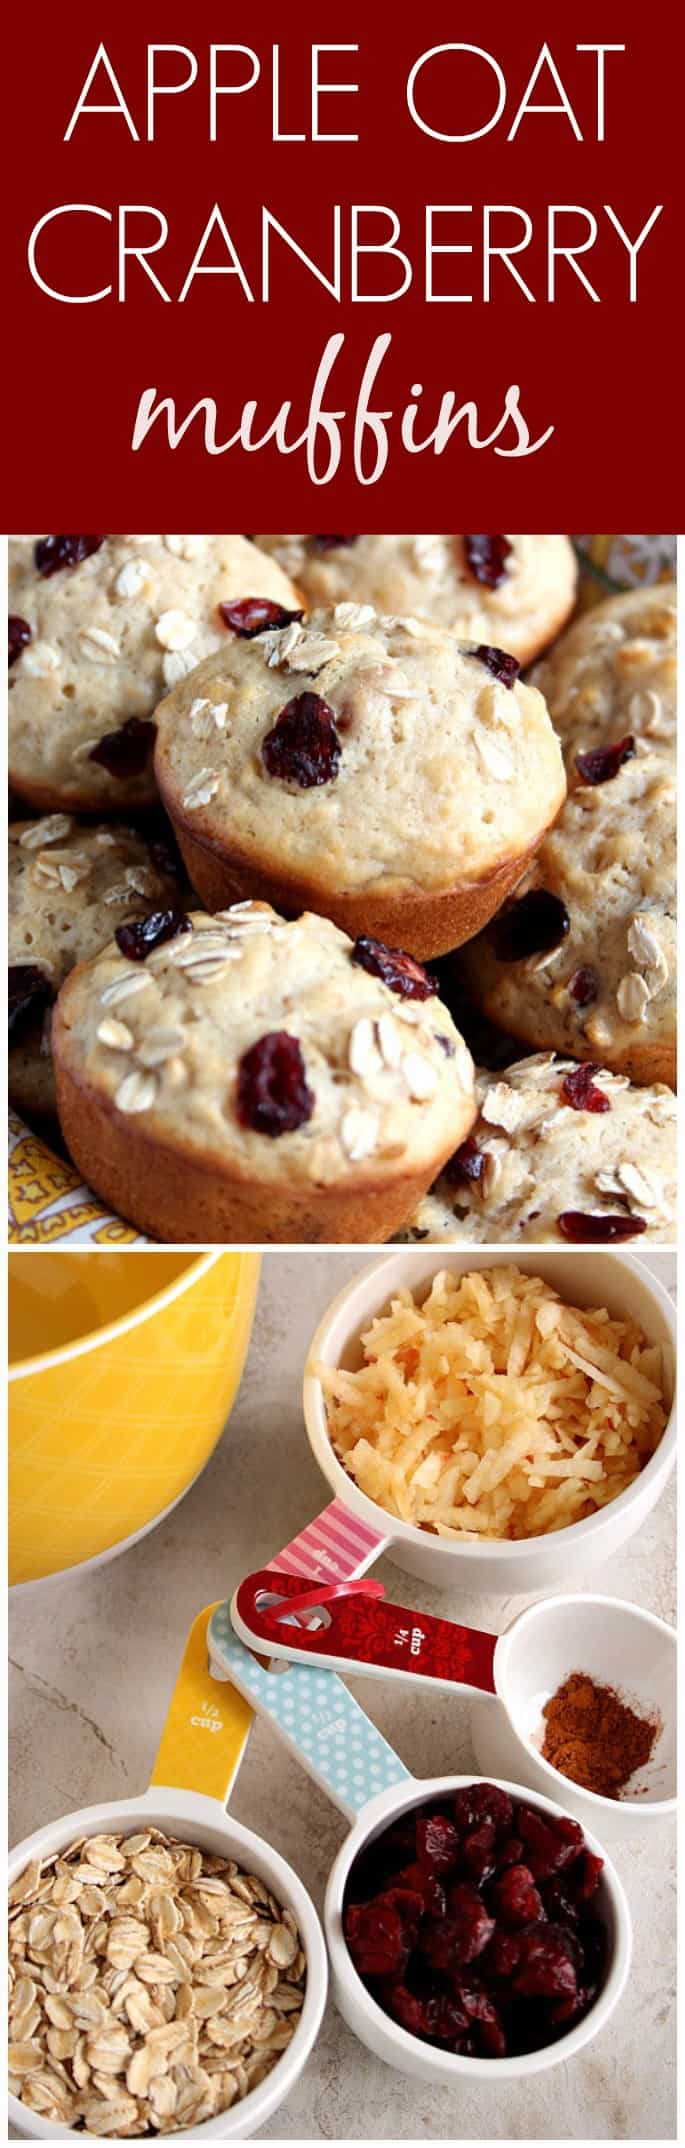 Apple Cranberry Oatmeal Muffins Recipe — Dishmaps